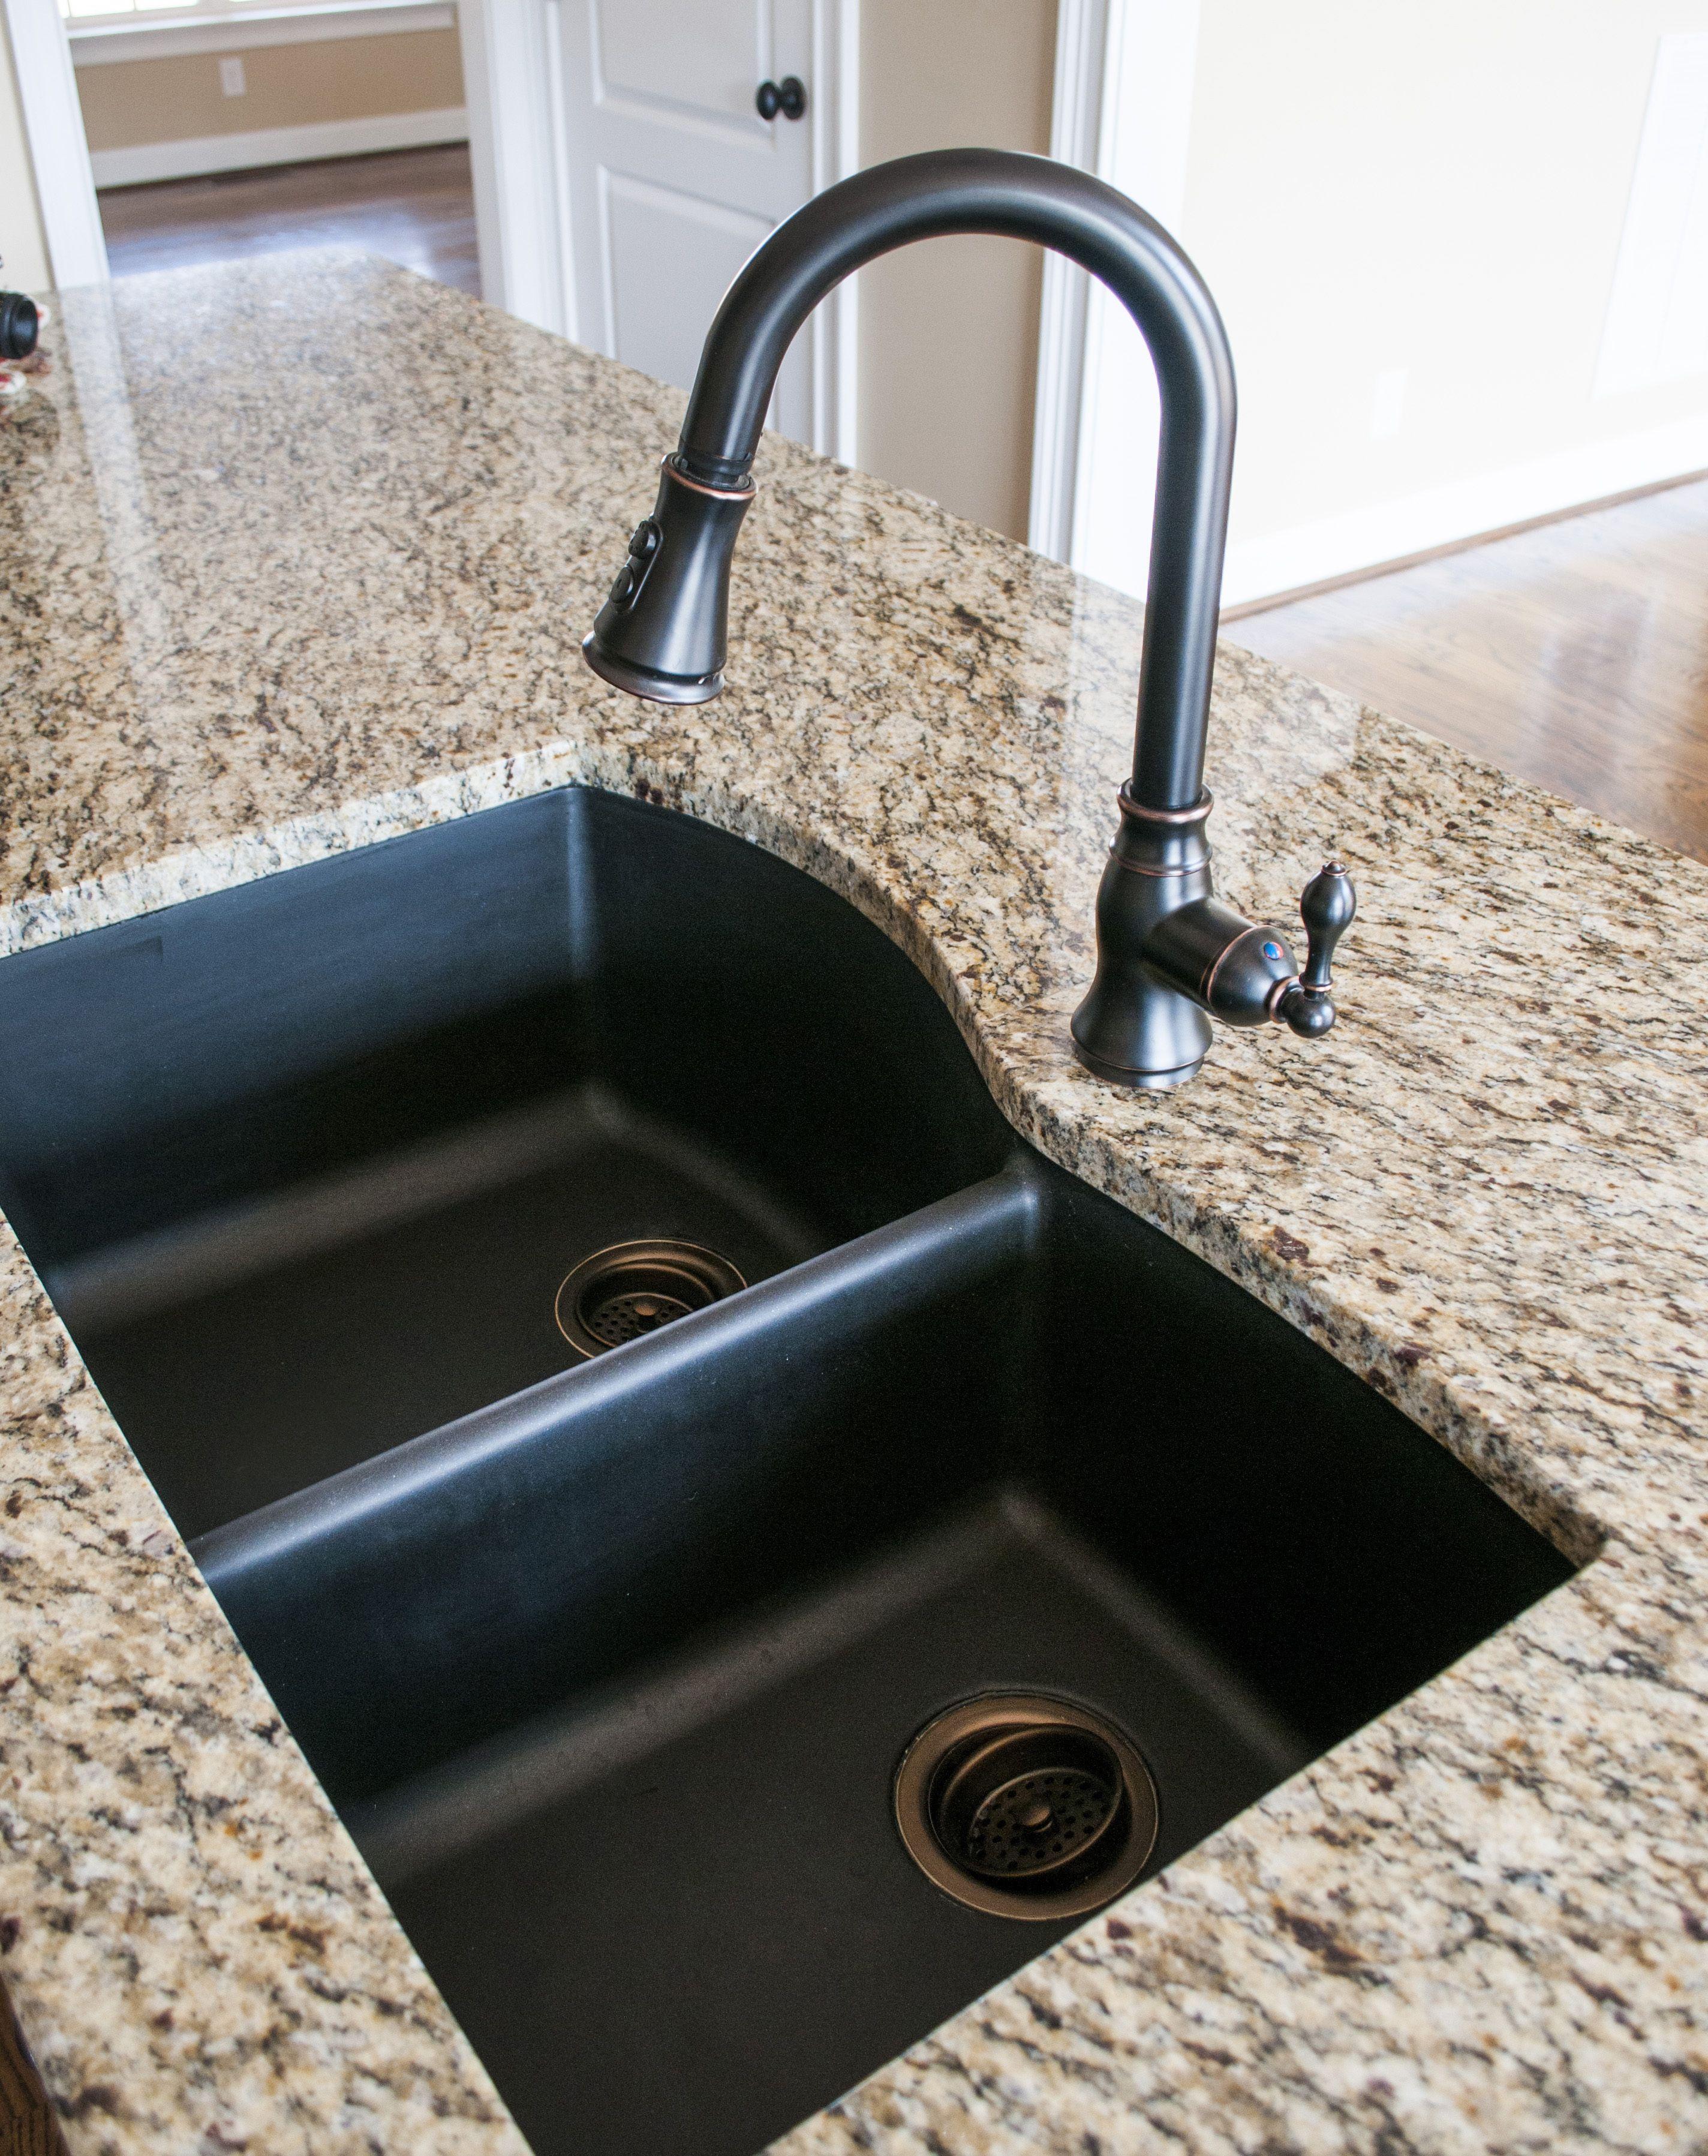 Genial Refinish Spulbecken Home Design Ideen Cool Kitchen Sink